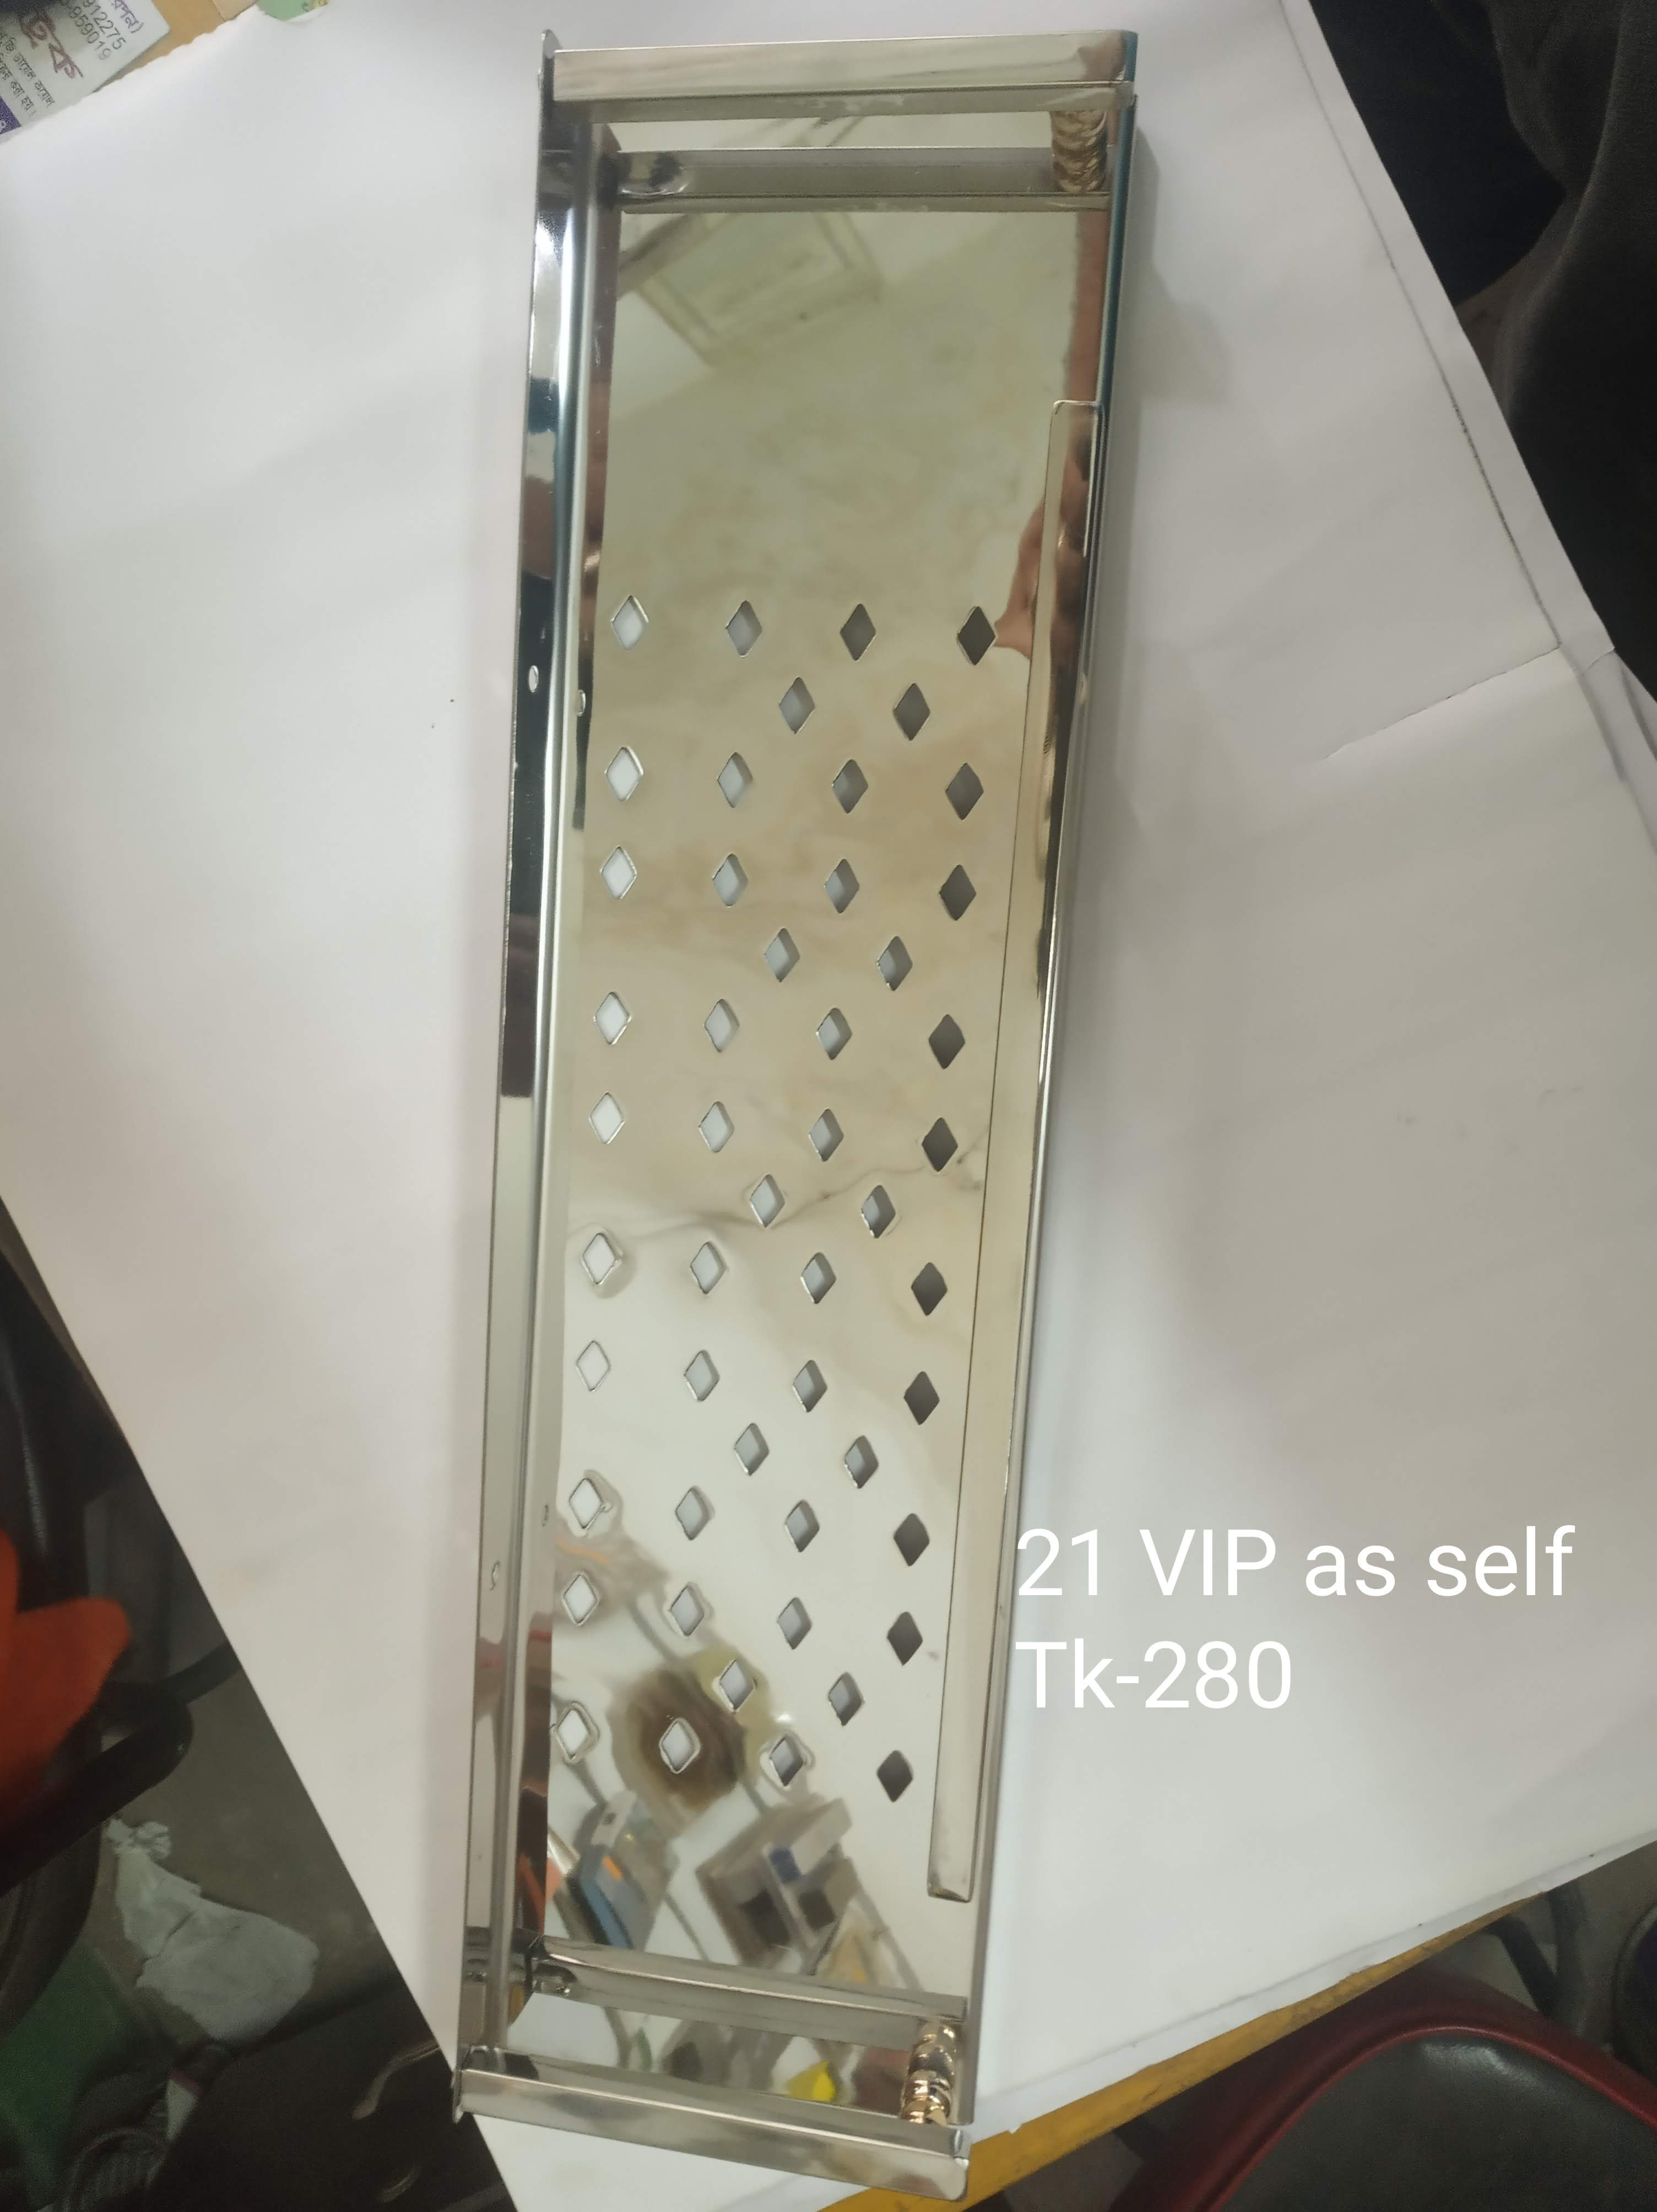 21 VIP ss self